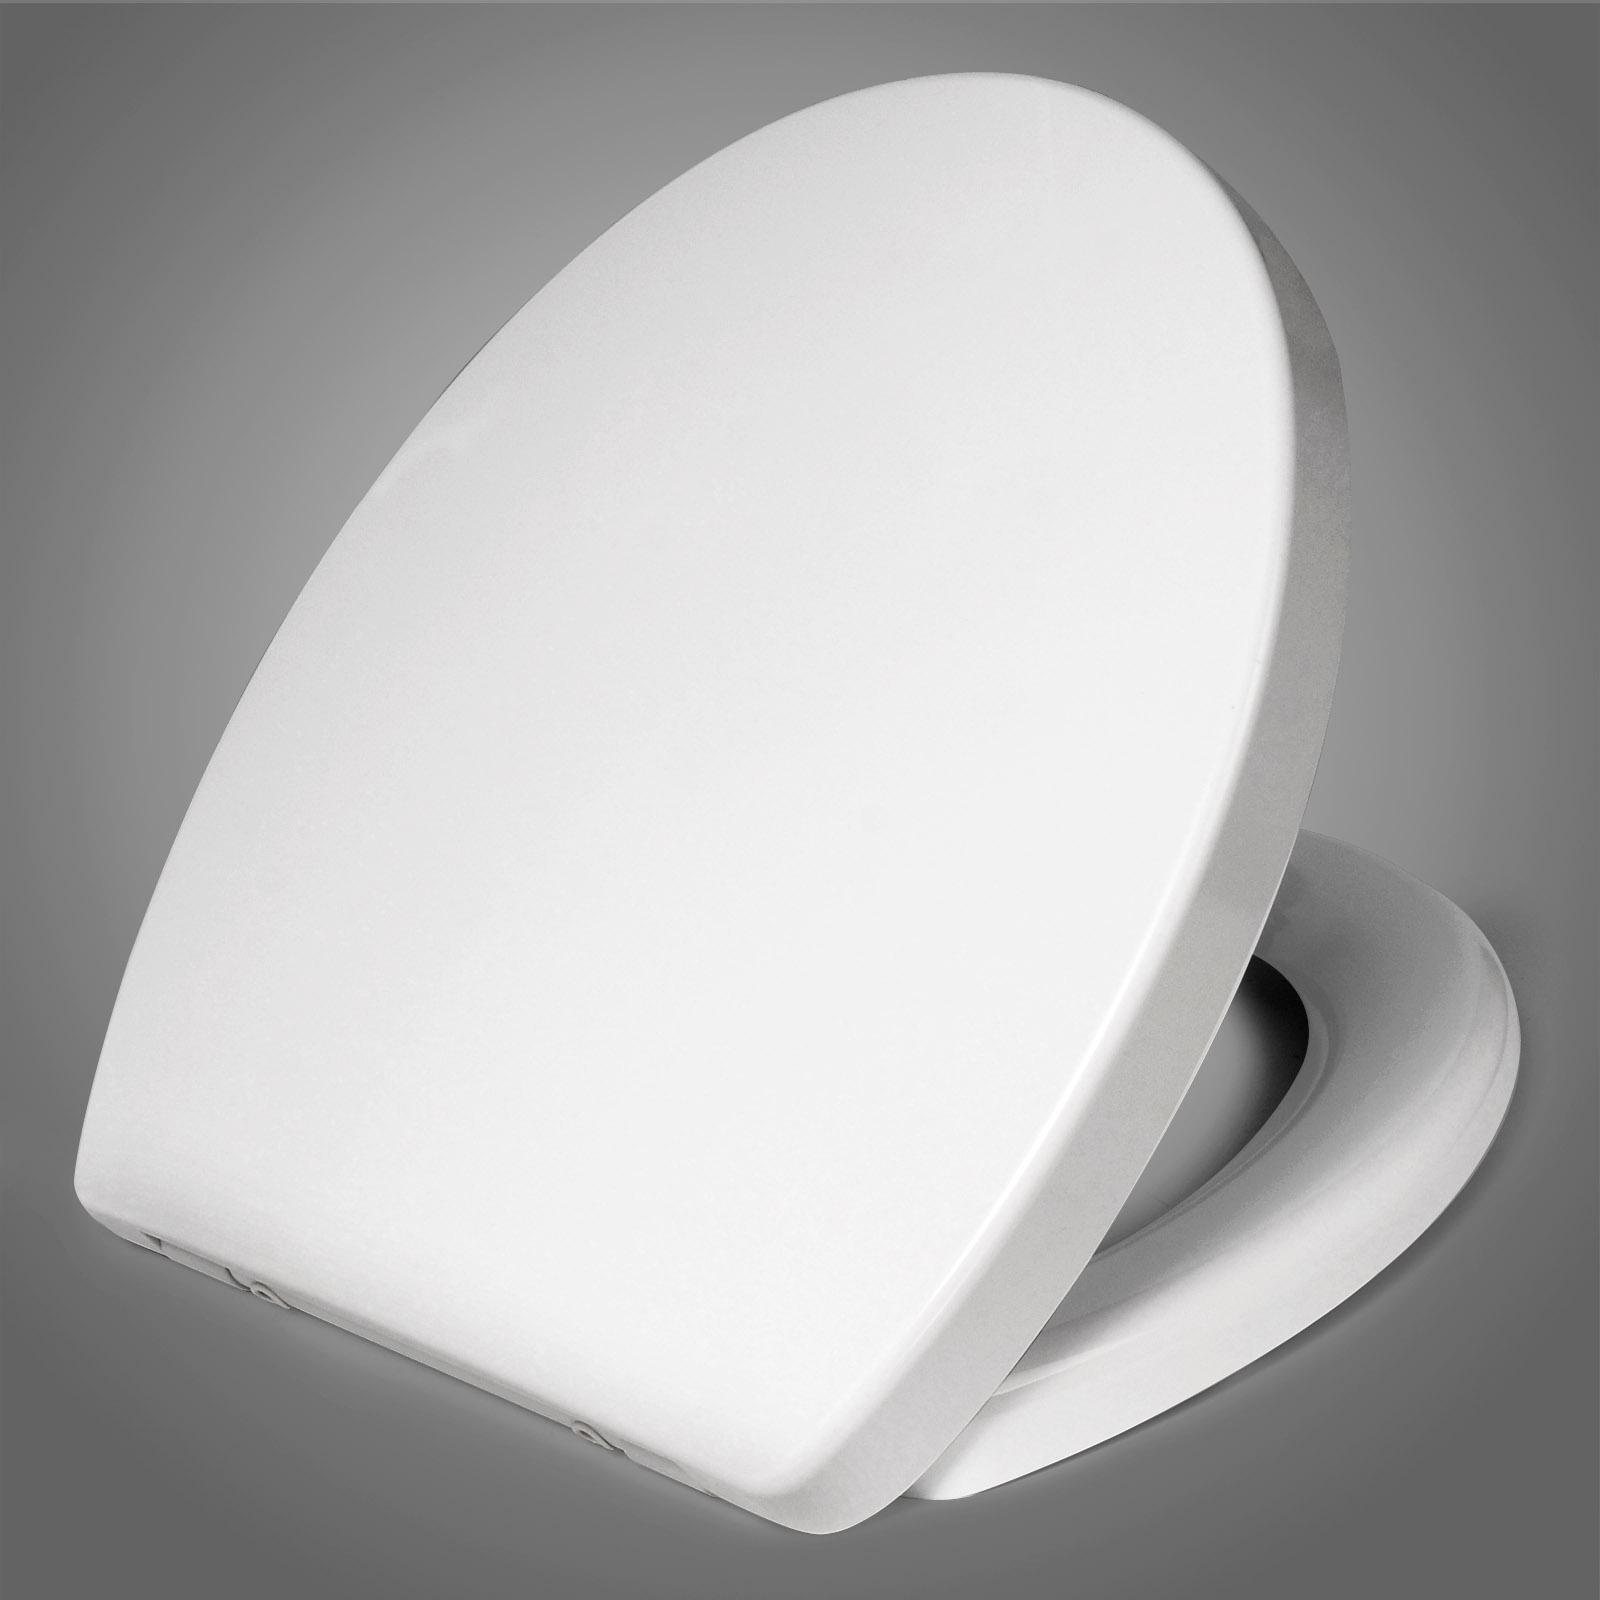 toilettensitz fast fix wc sitz mit absenkautomatik duroplast weiss ws2724 ebay. Black Bedroom Furniture Sets. Home Design Ideas